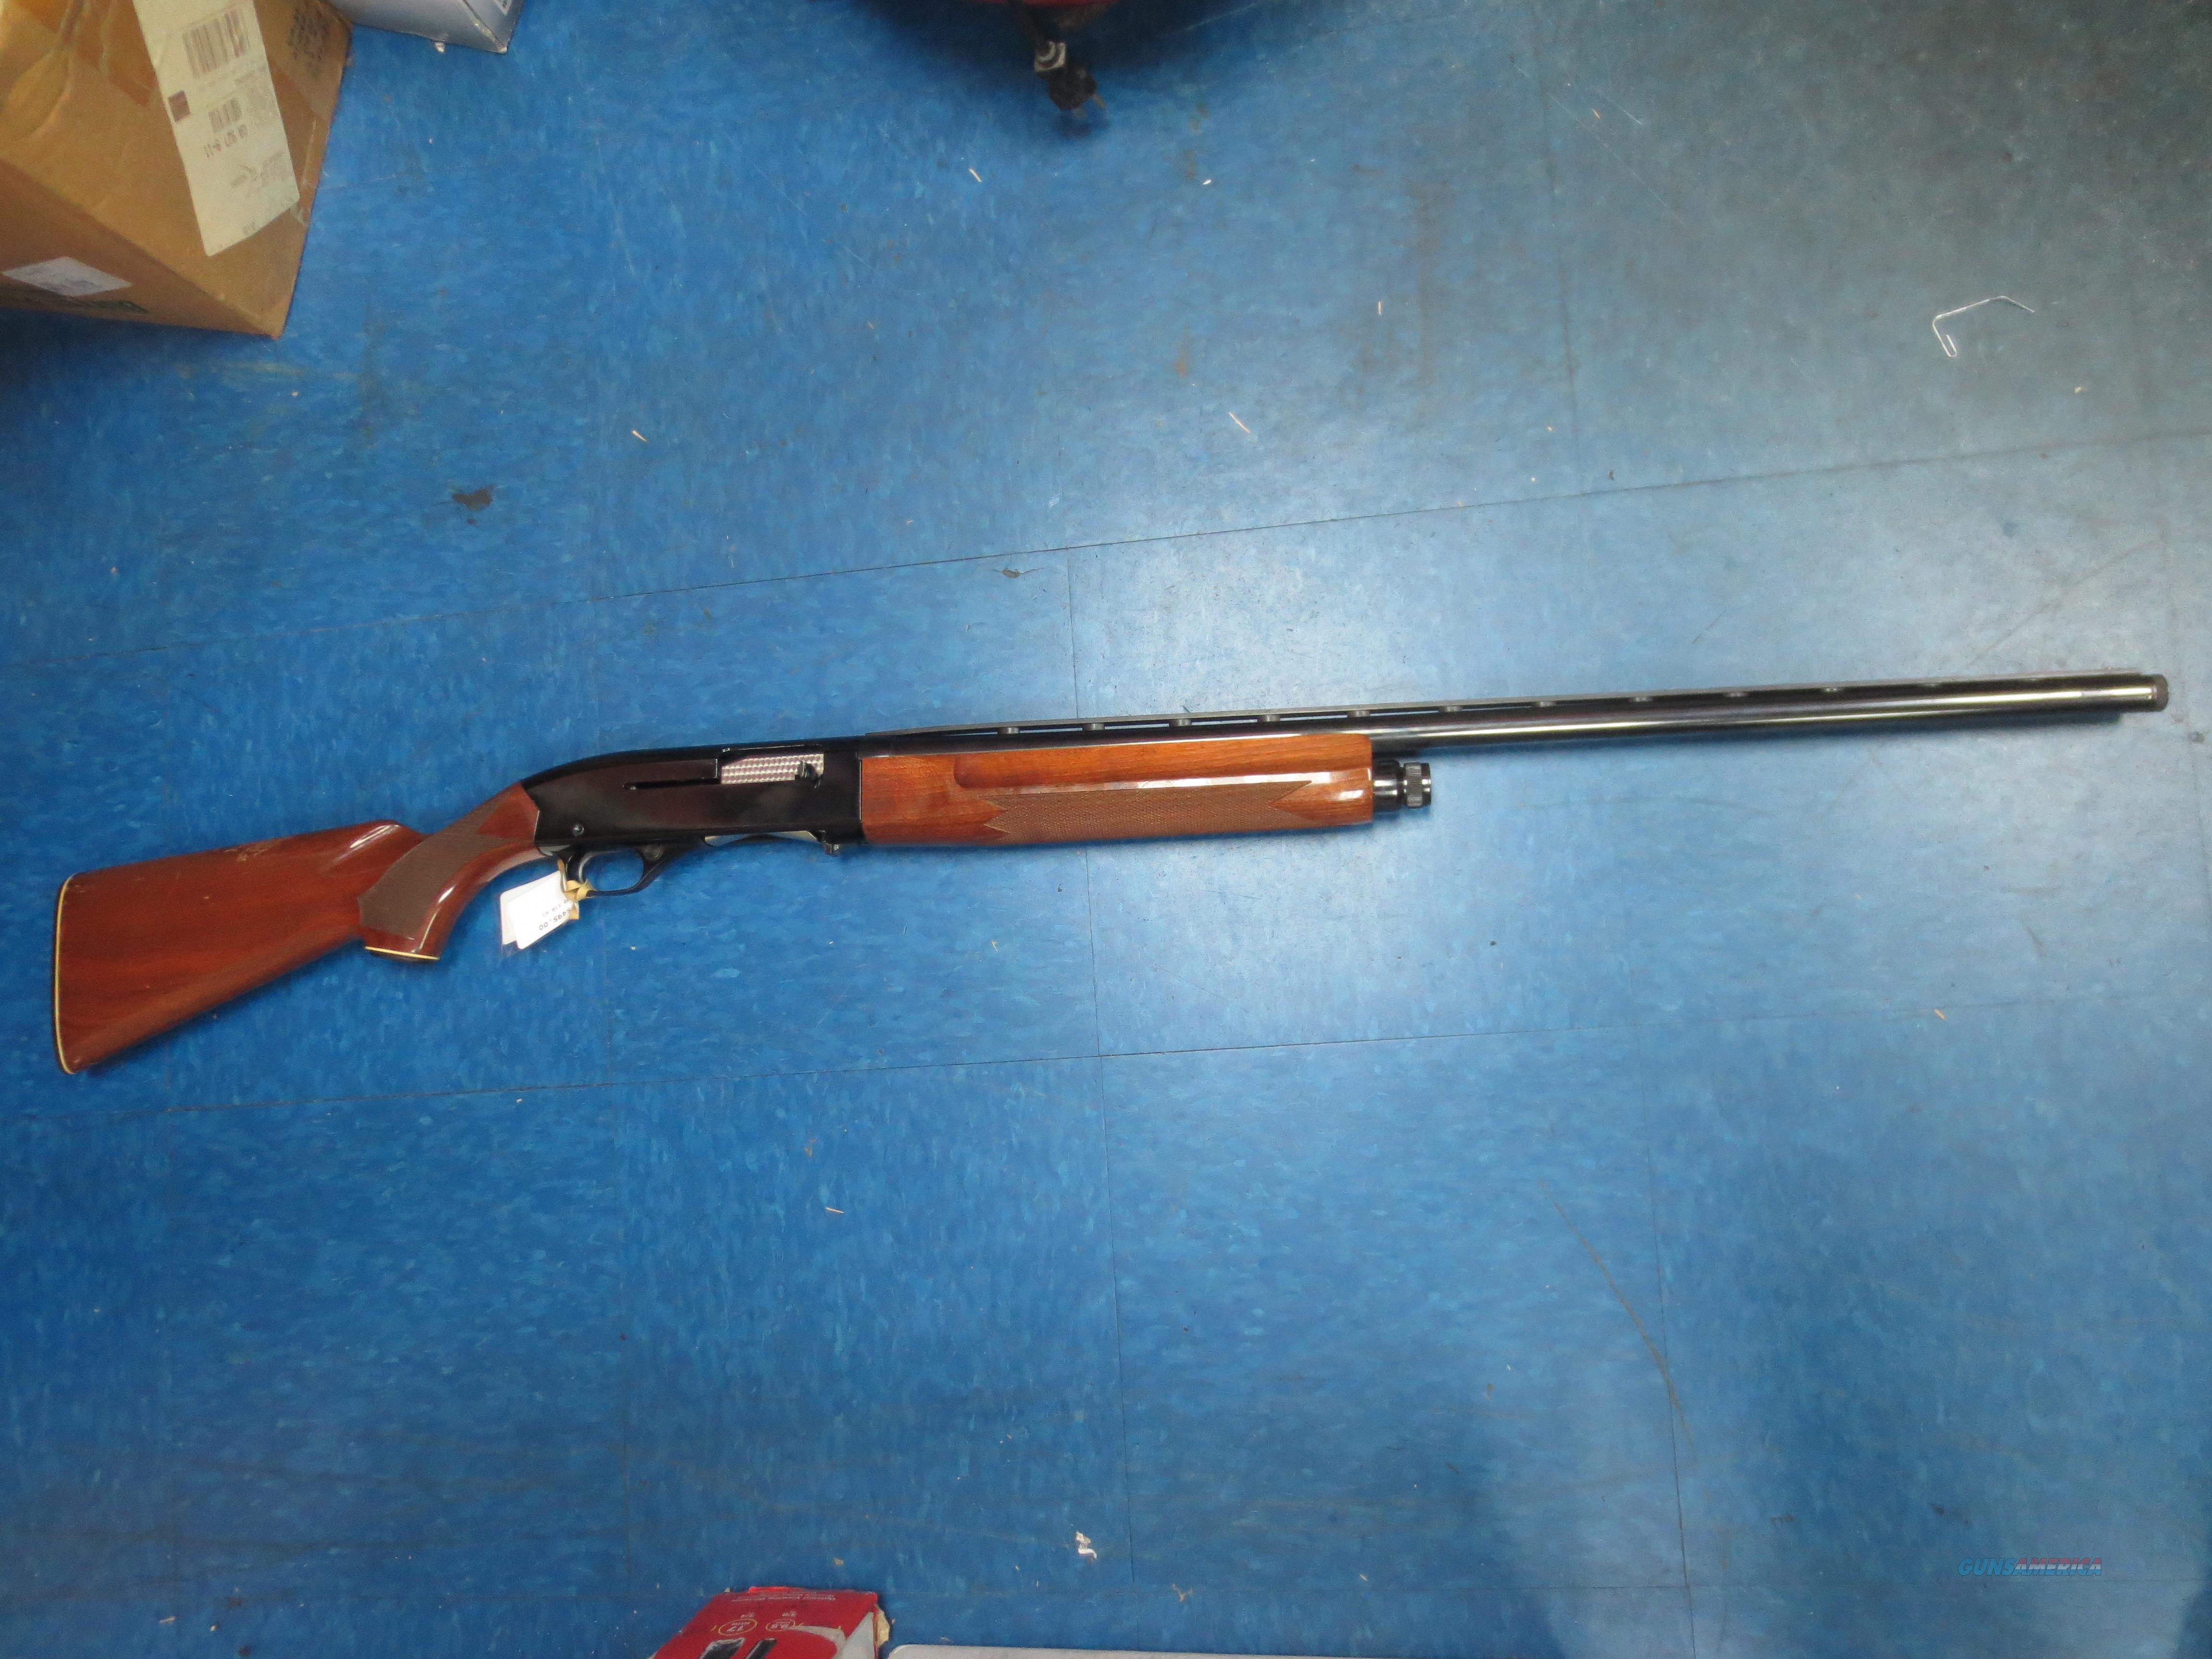 Winchester mod# 1500 XTR 20 gau semi-auto w/winchoke  Guns > Shotguns > Winchester Shotguns - Modern > Autoloaders > Hunting